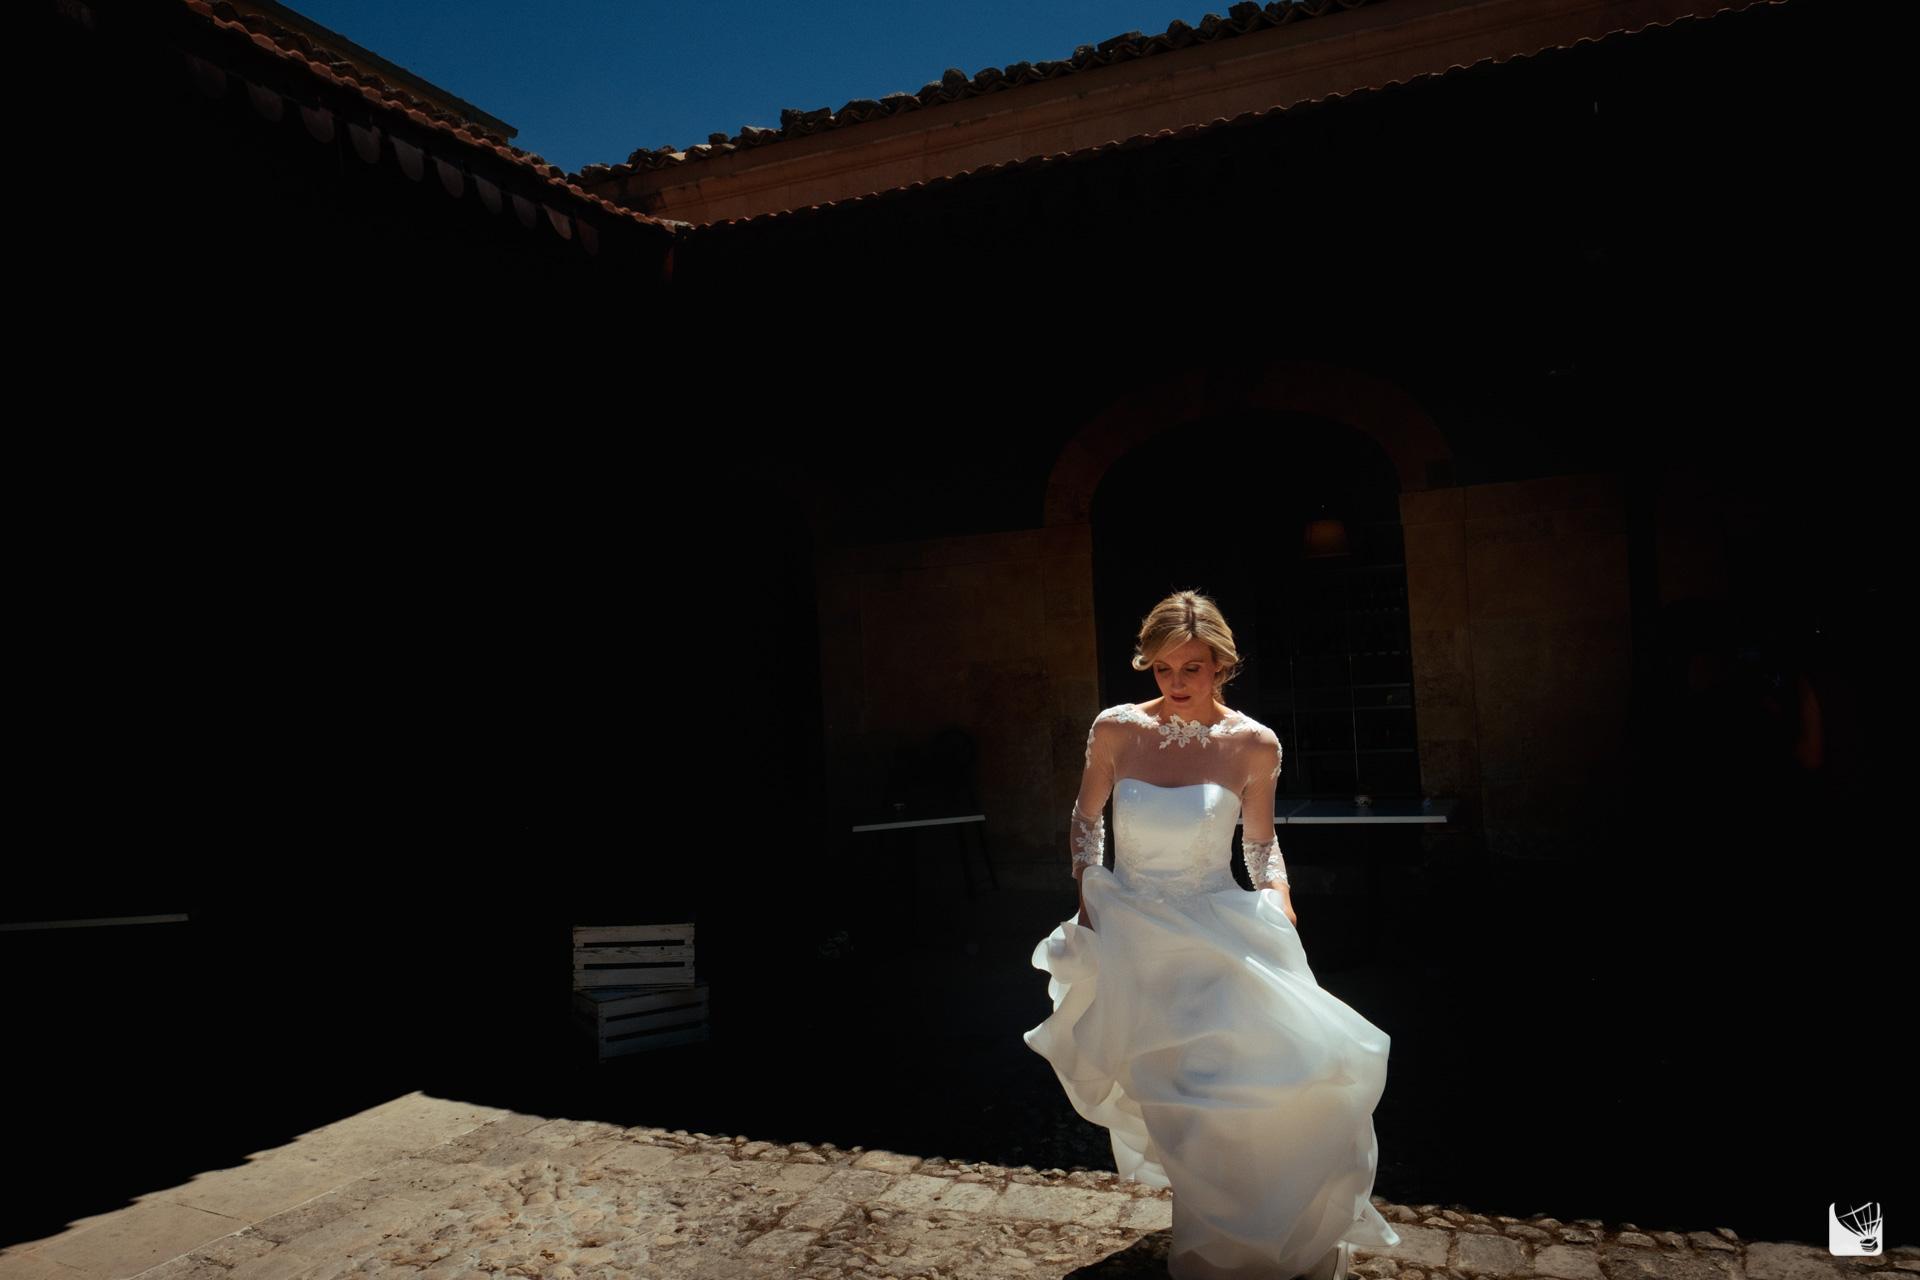 wedding_in_marzamemi-26.jpg